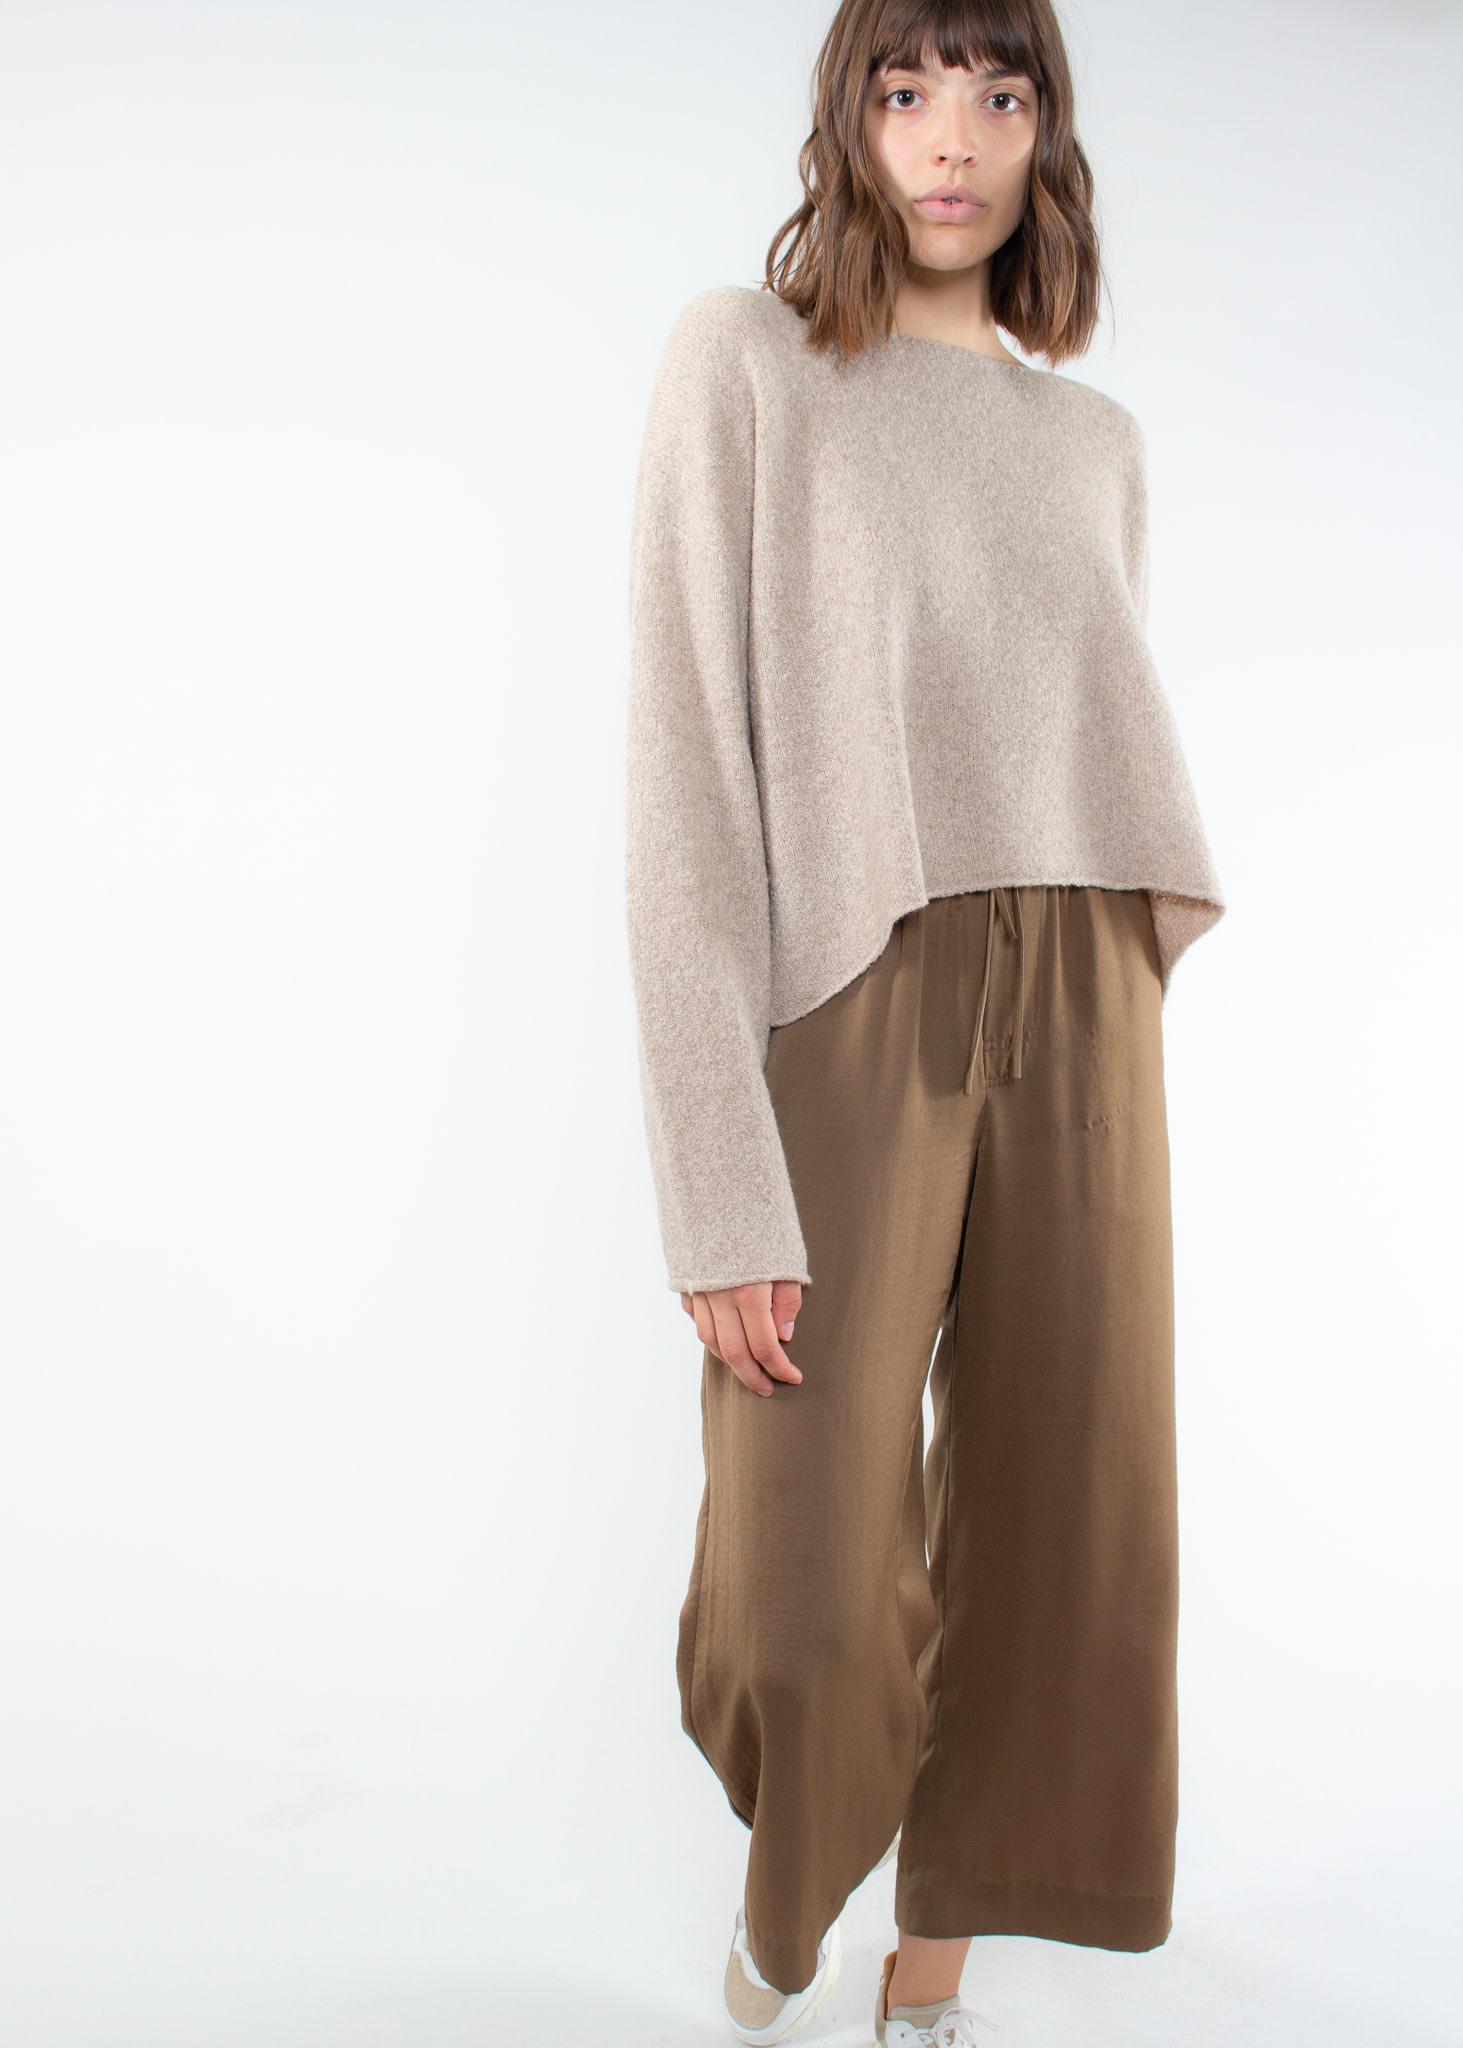 Leighton sweater sandstone